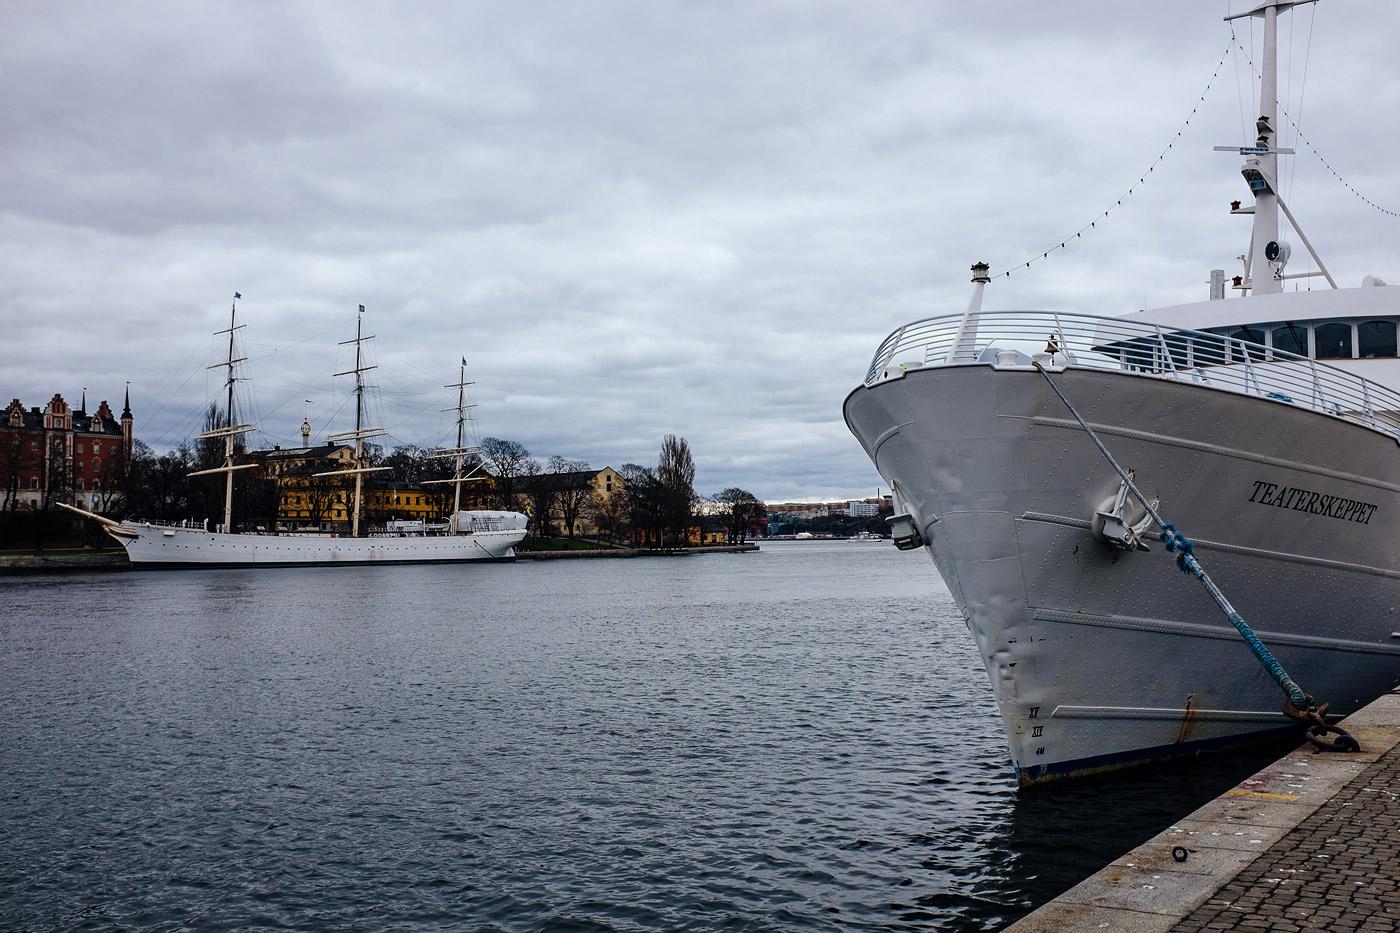 stockholm-8